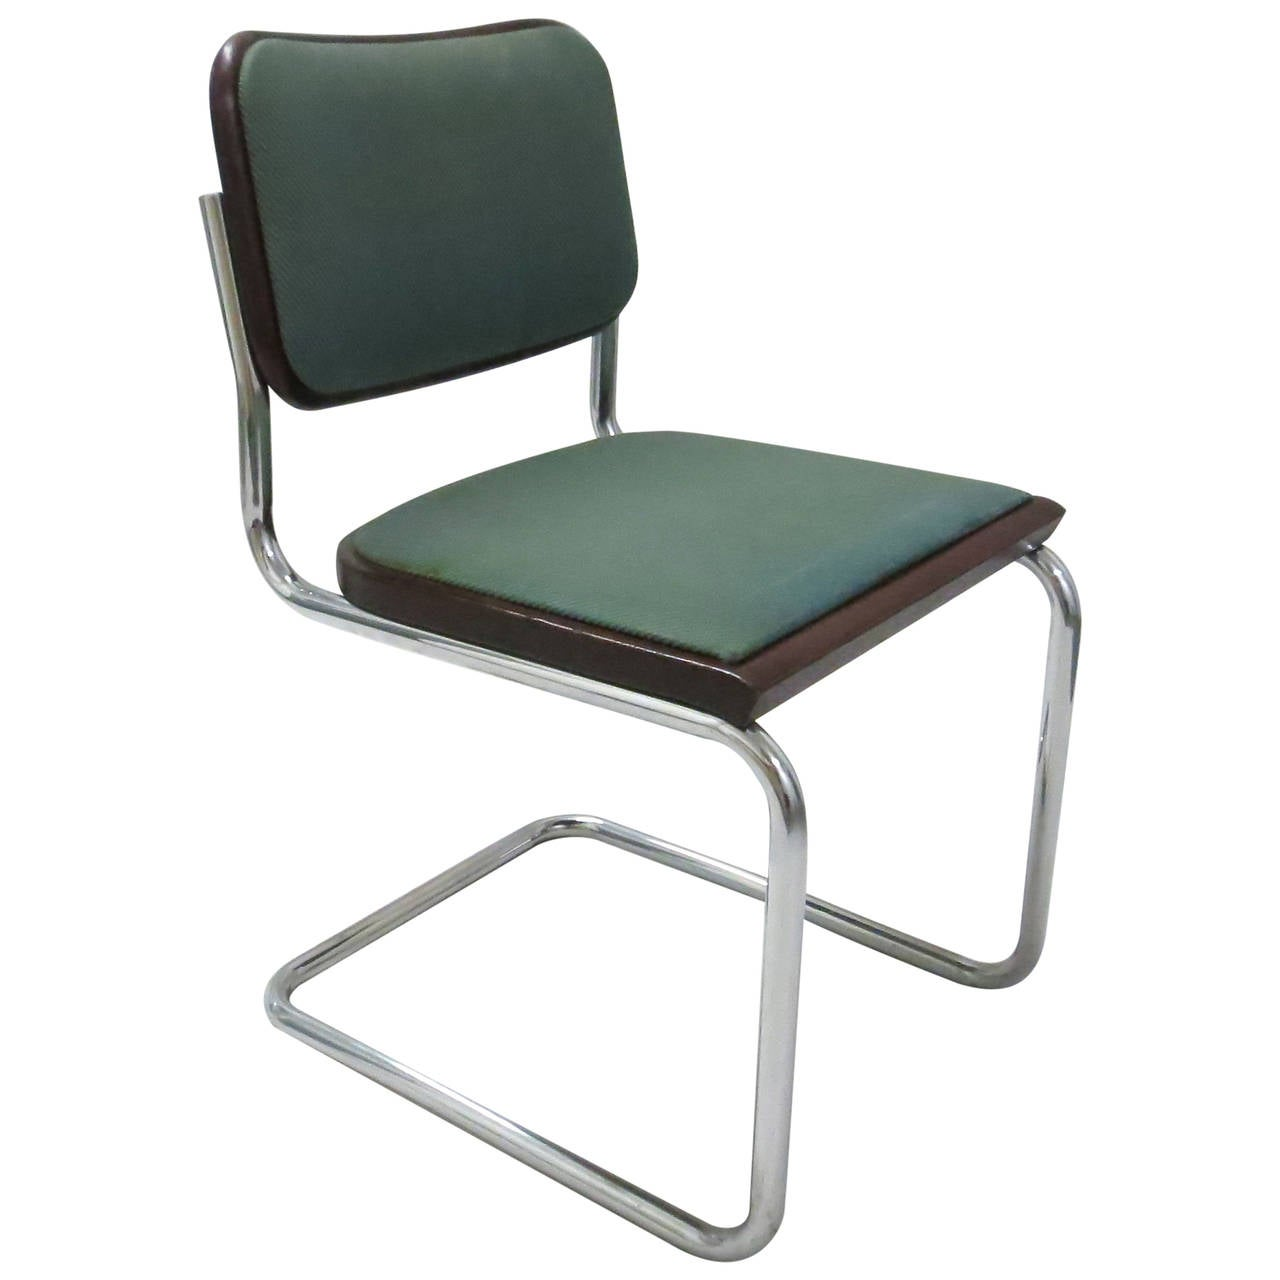 Bauhaus chair breuer - 100 Dining Chairs By Marcel Breuer Bauhaus 1928 Knoll Produced In 1985 1